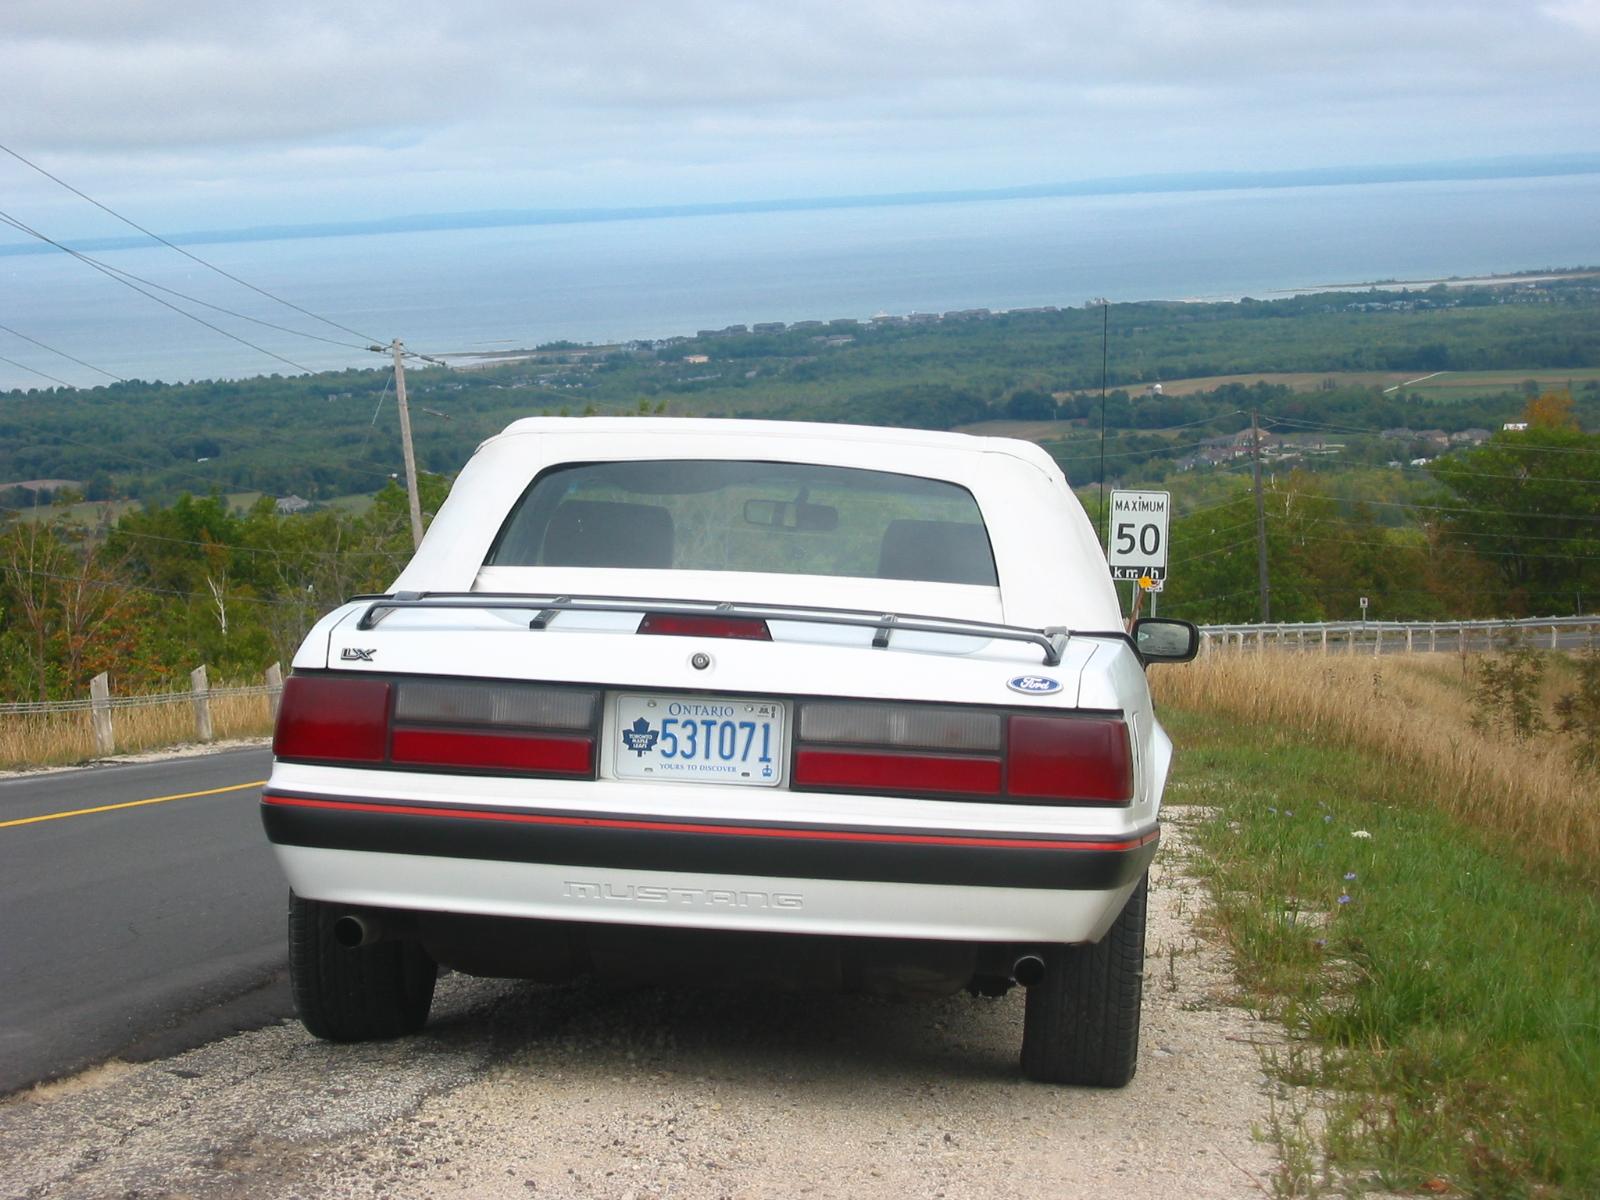 1989 Mustang Lx Convertible